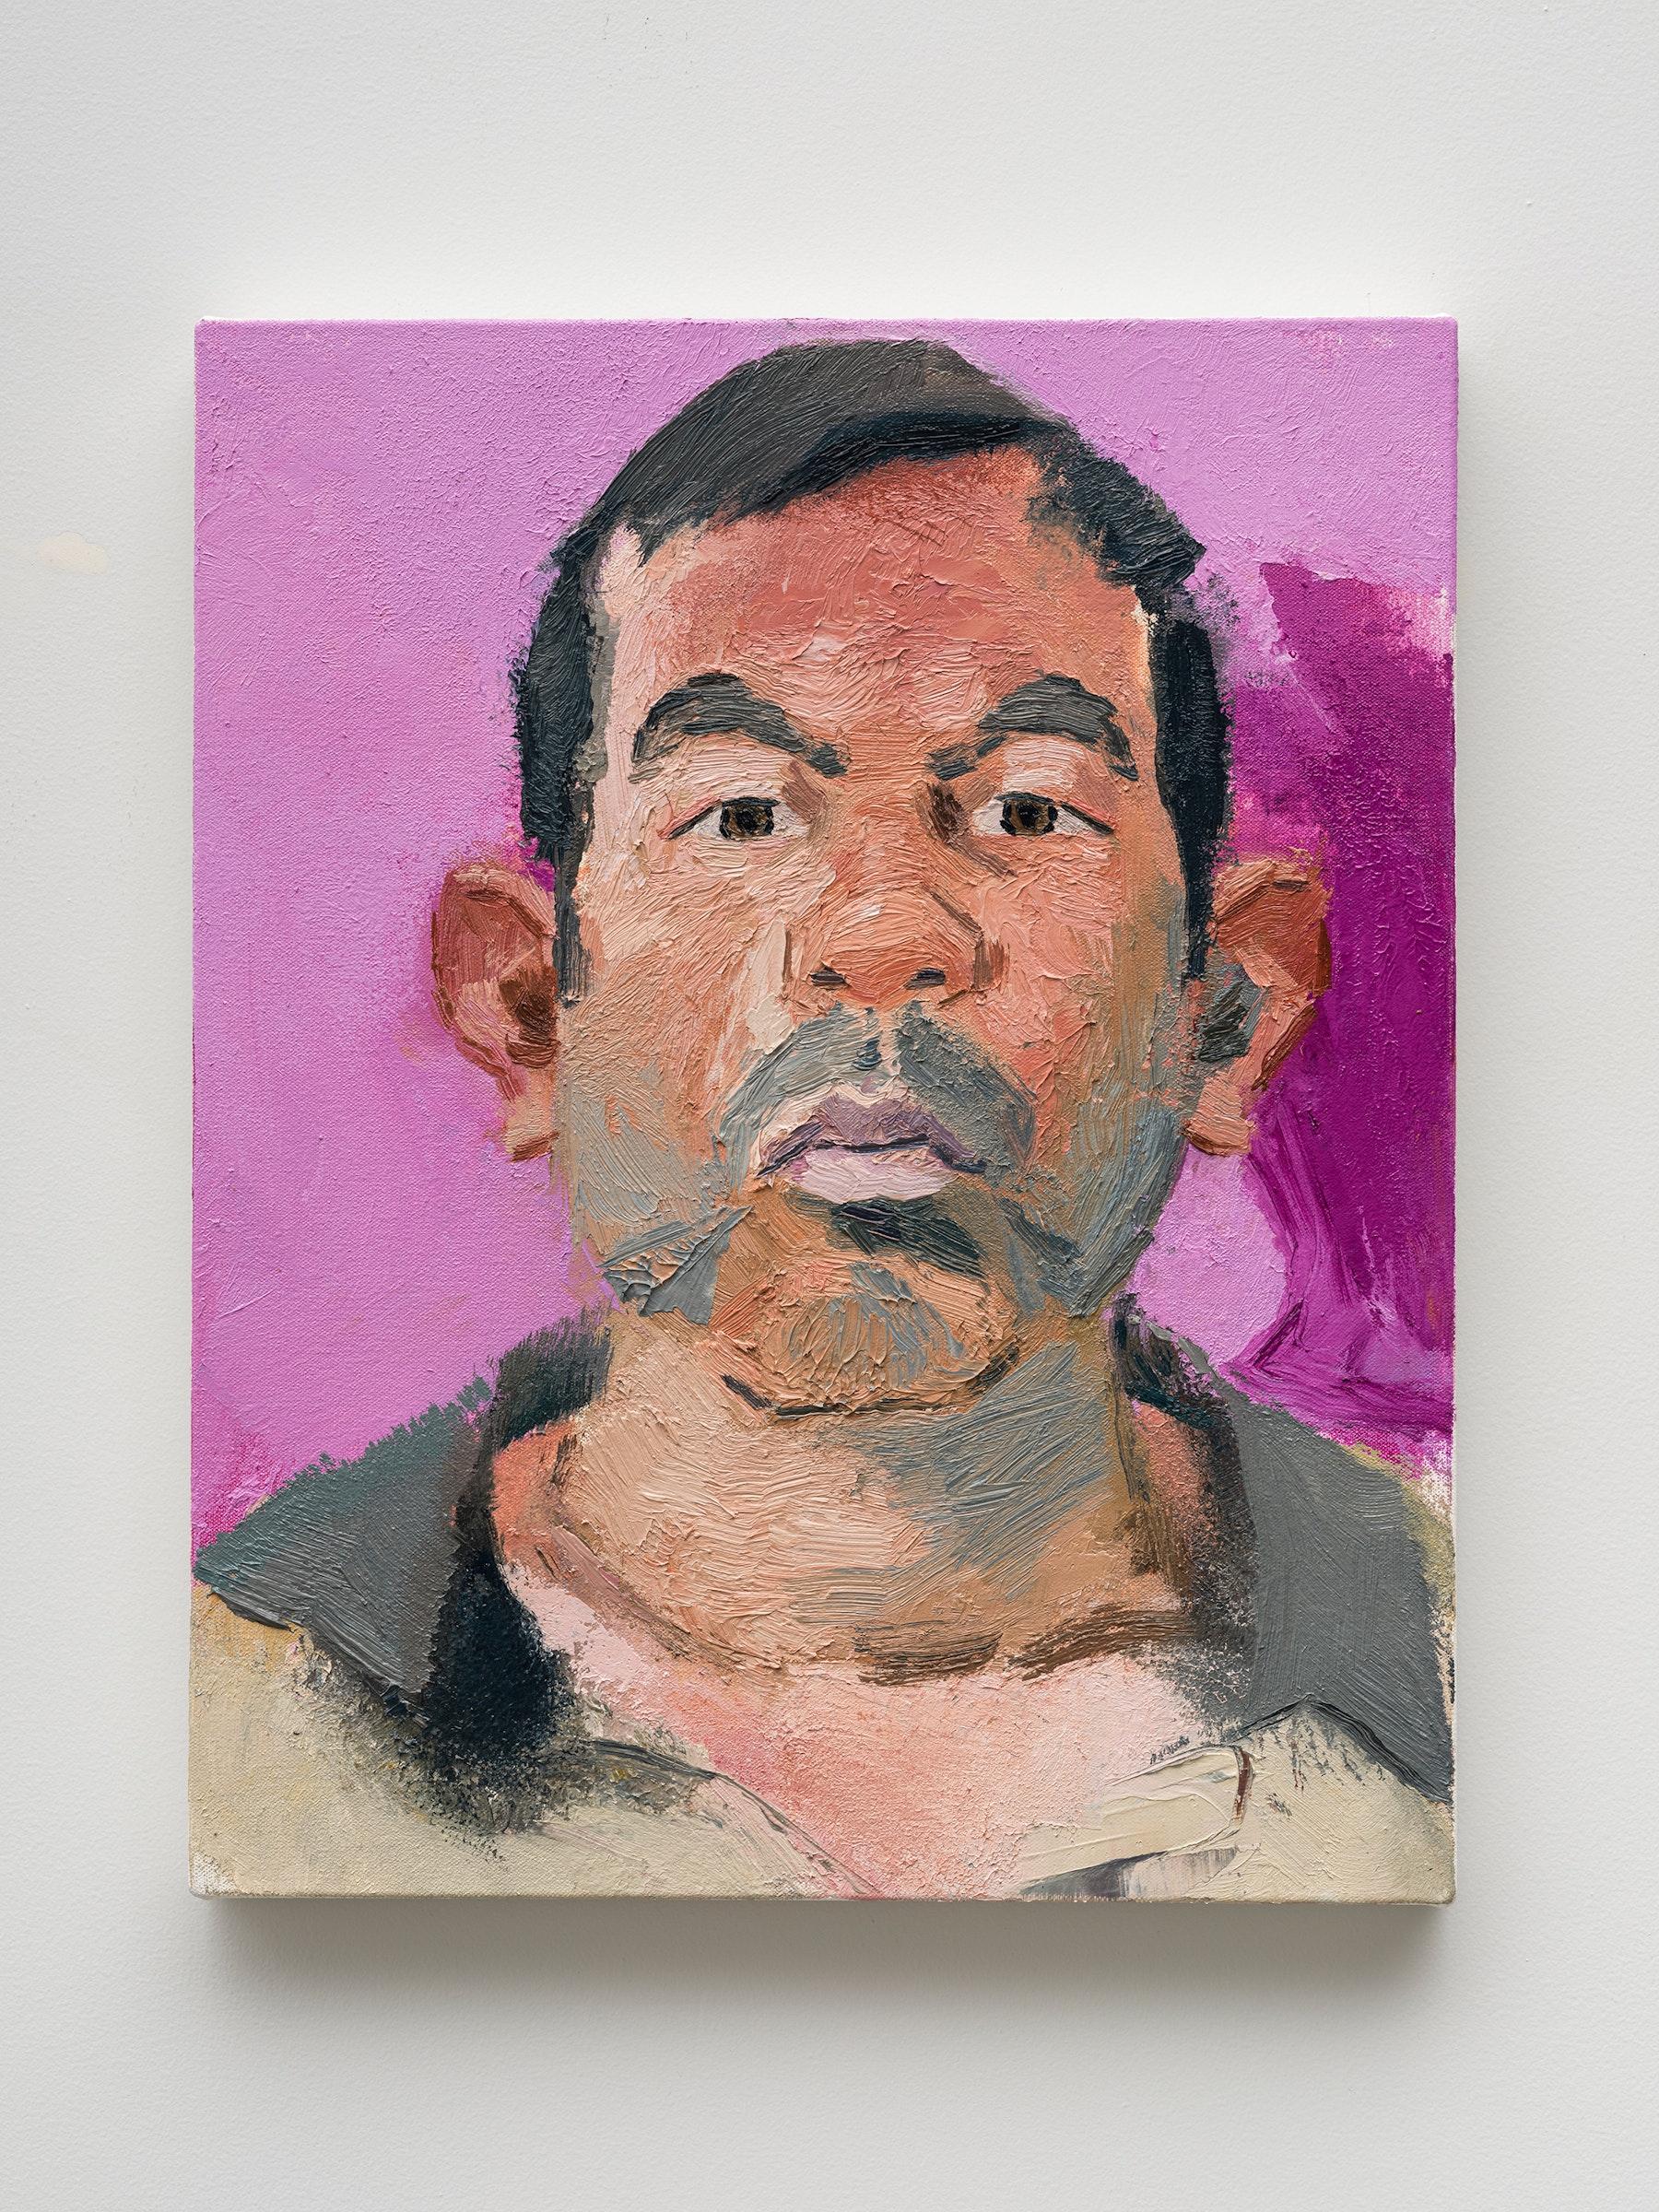 "John Sonsini ""Gabriel,"" 2021 Oil on canvas 20"" x 16"" [HxW] (50.8 x 40.64 cm) Inventory #SON132 Courtesy of the artist and Vielmetter Los Angeles Photo credit: Jeff Mclane"